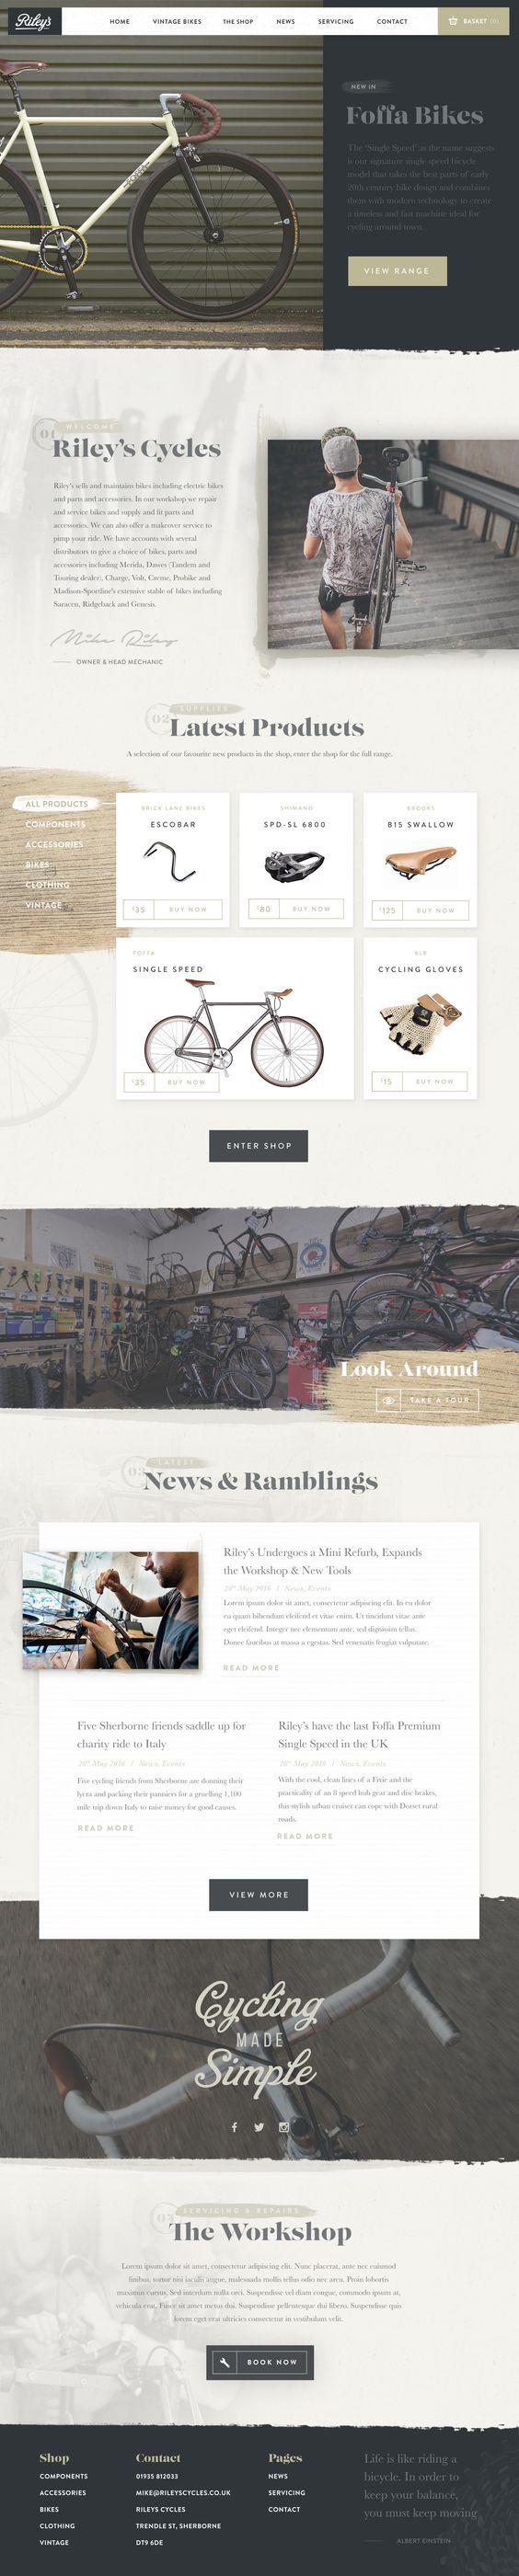 Riley's Cycles Web Design | Fivestar Branding – Design and Branding Agency & Inspiration Gallery